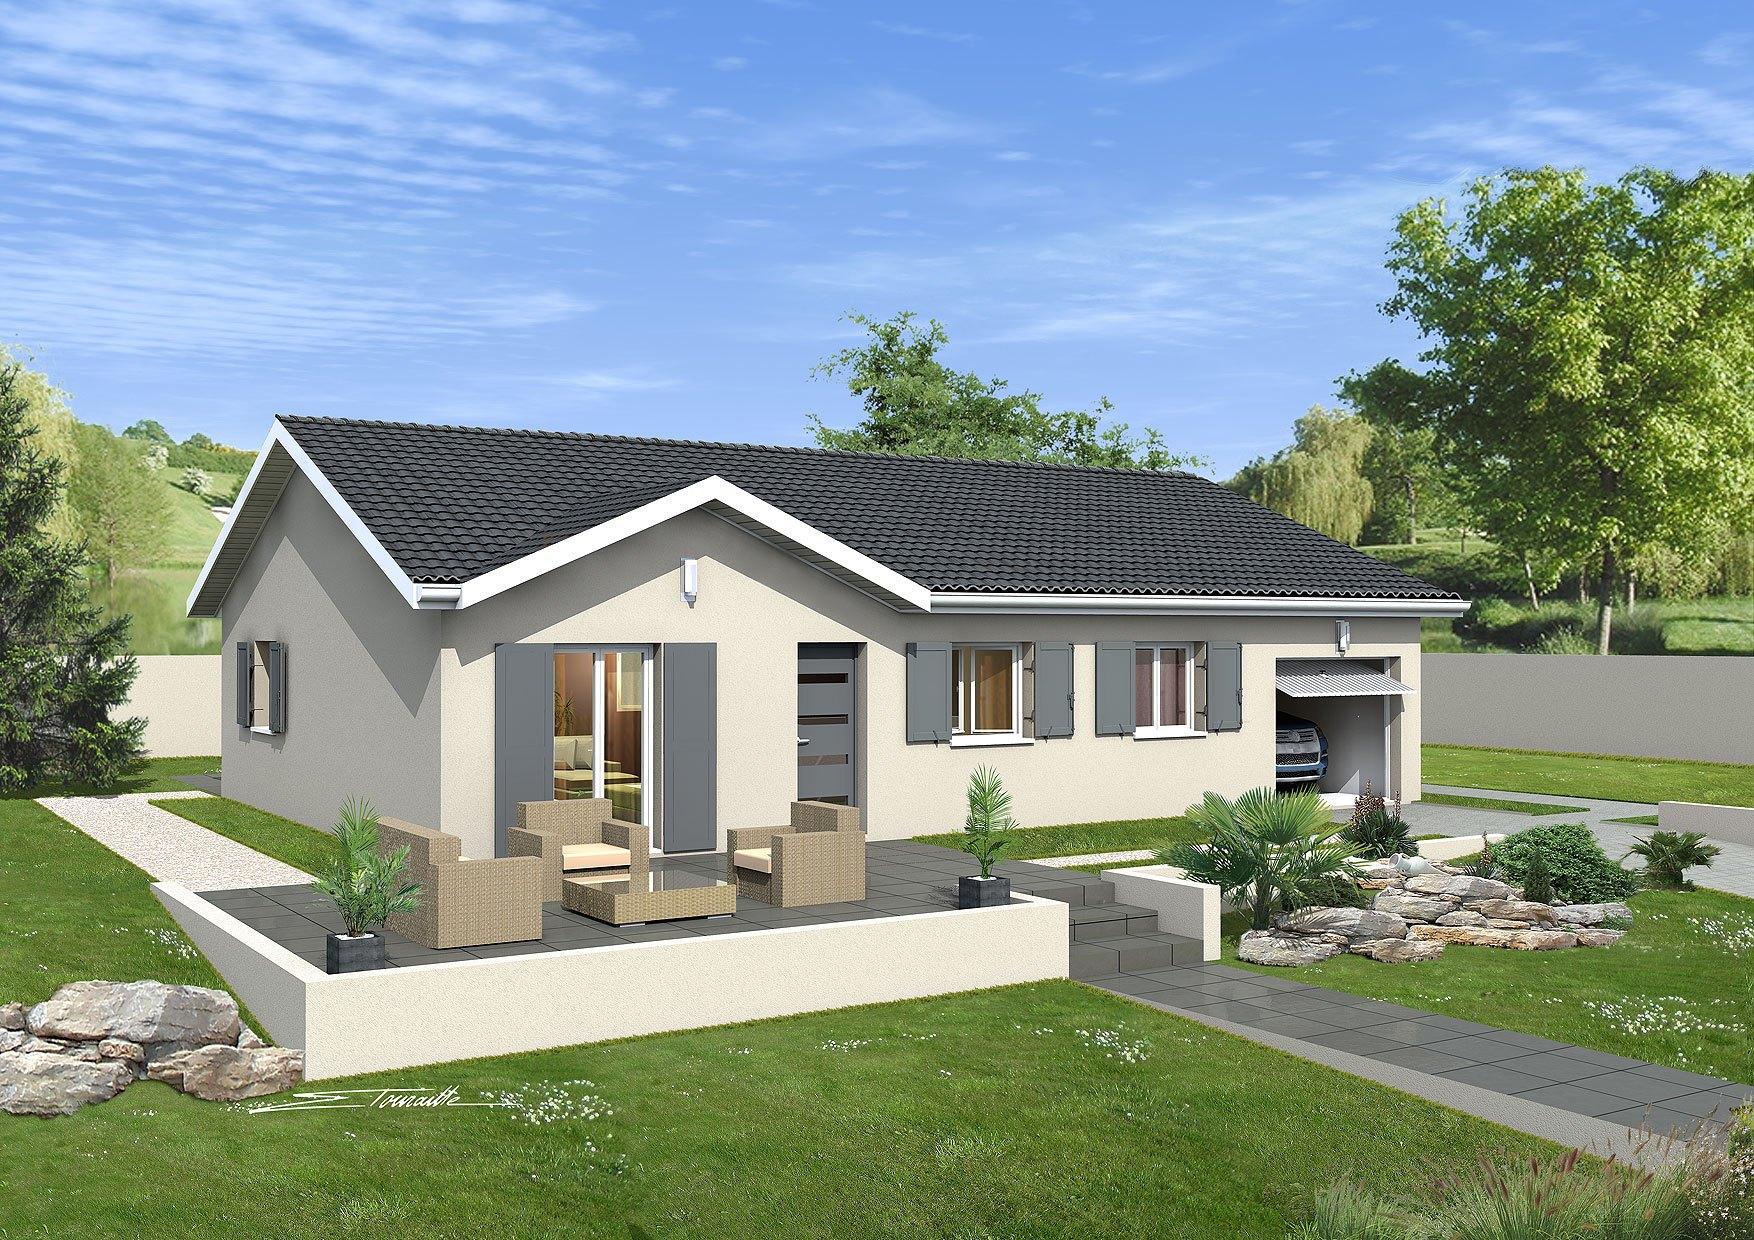 Maisons + Terrains du constructeur MAISONS PUNCH BOURGOIN • 89 m² • GRANIEU